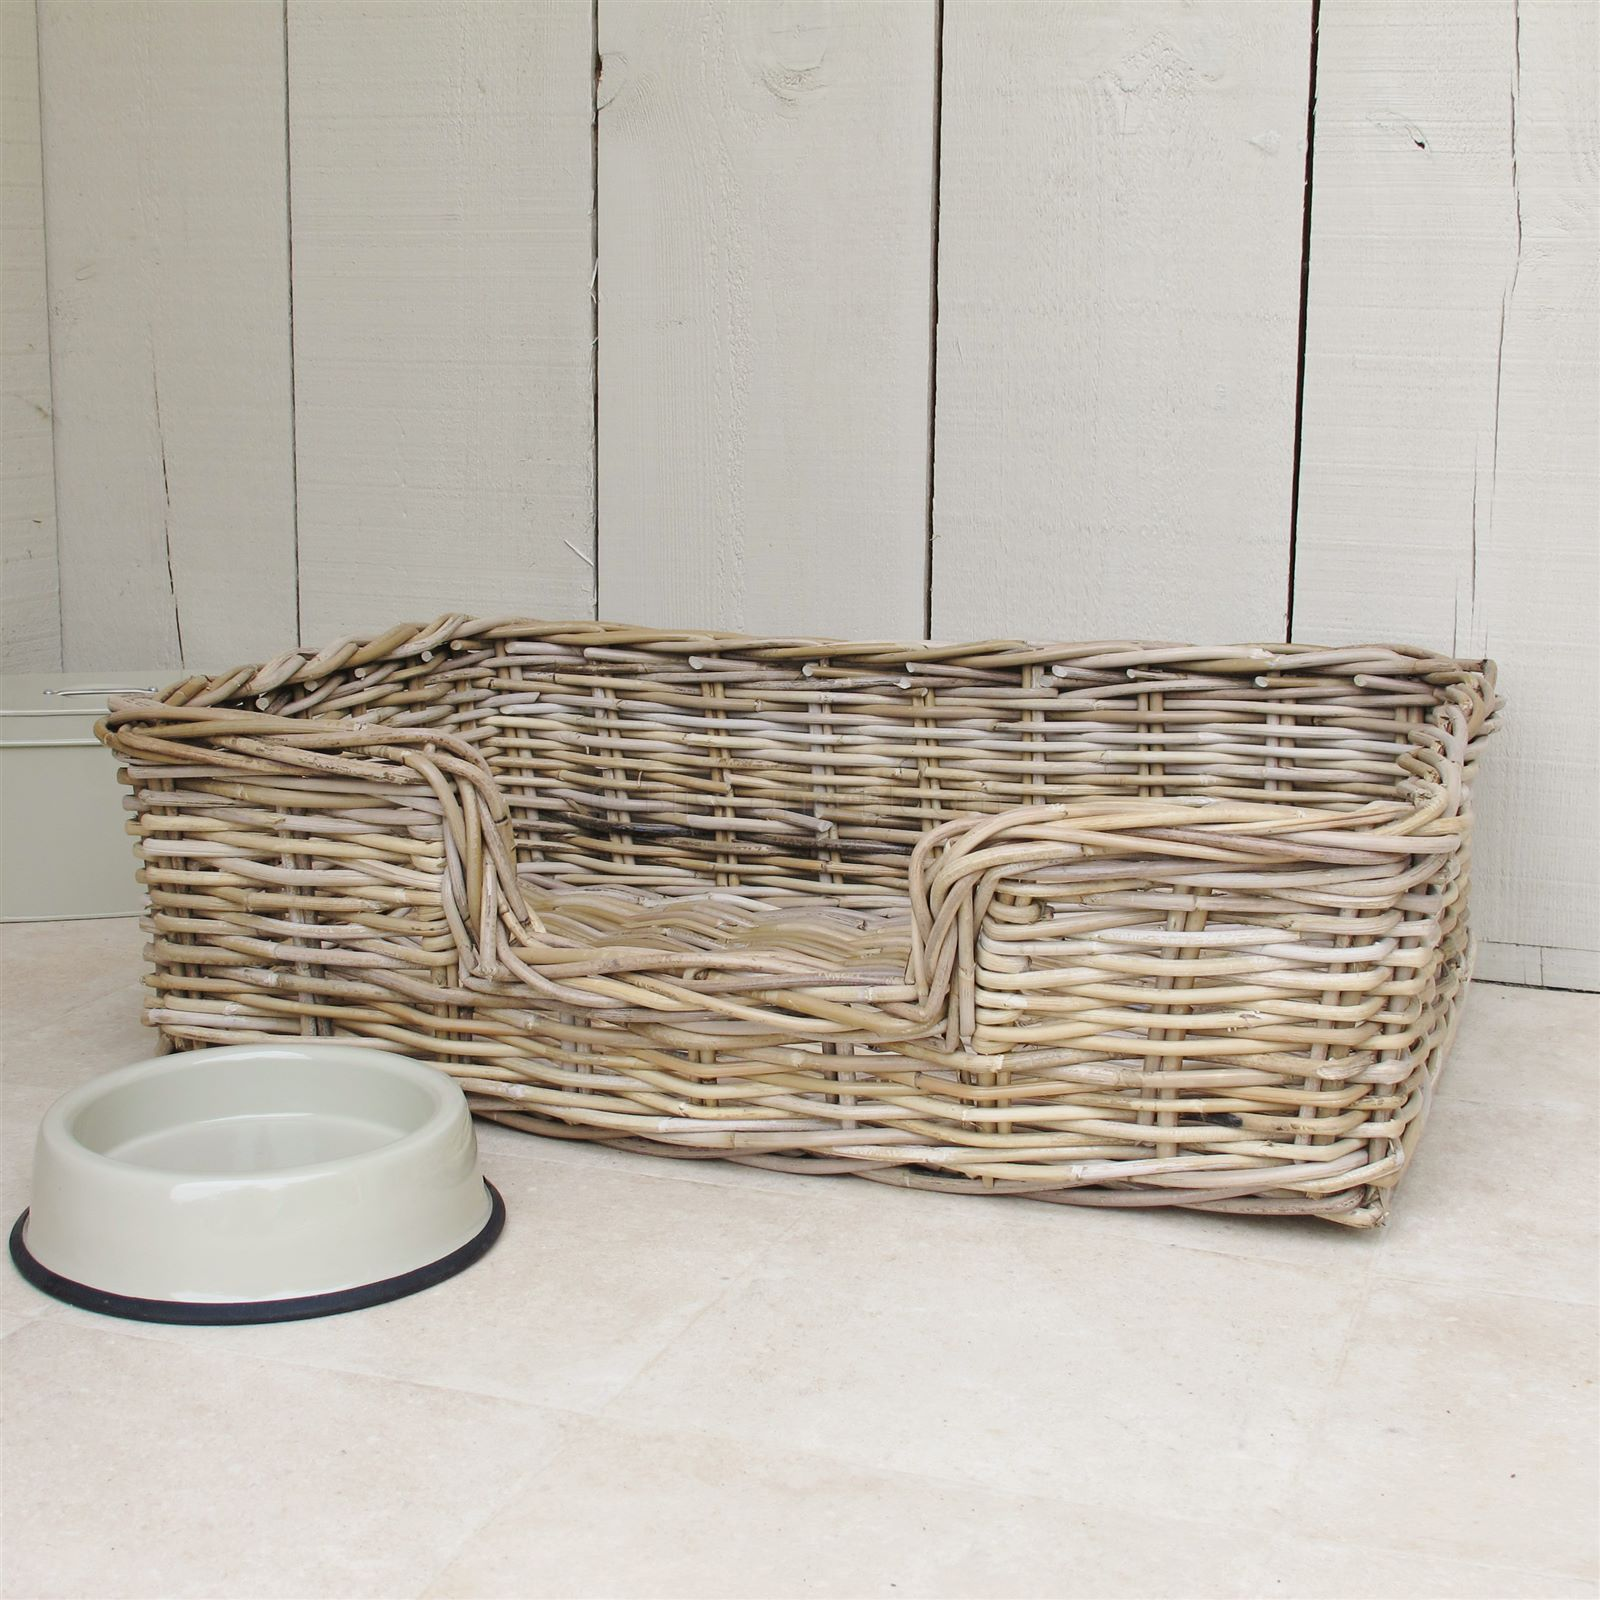 Wicker Dog Bed Basket